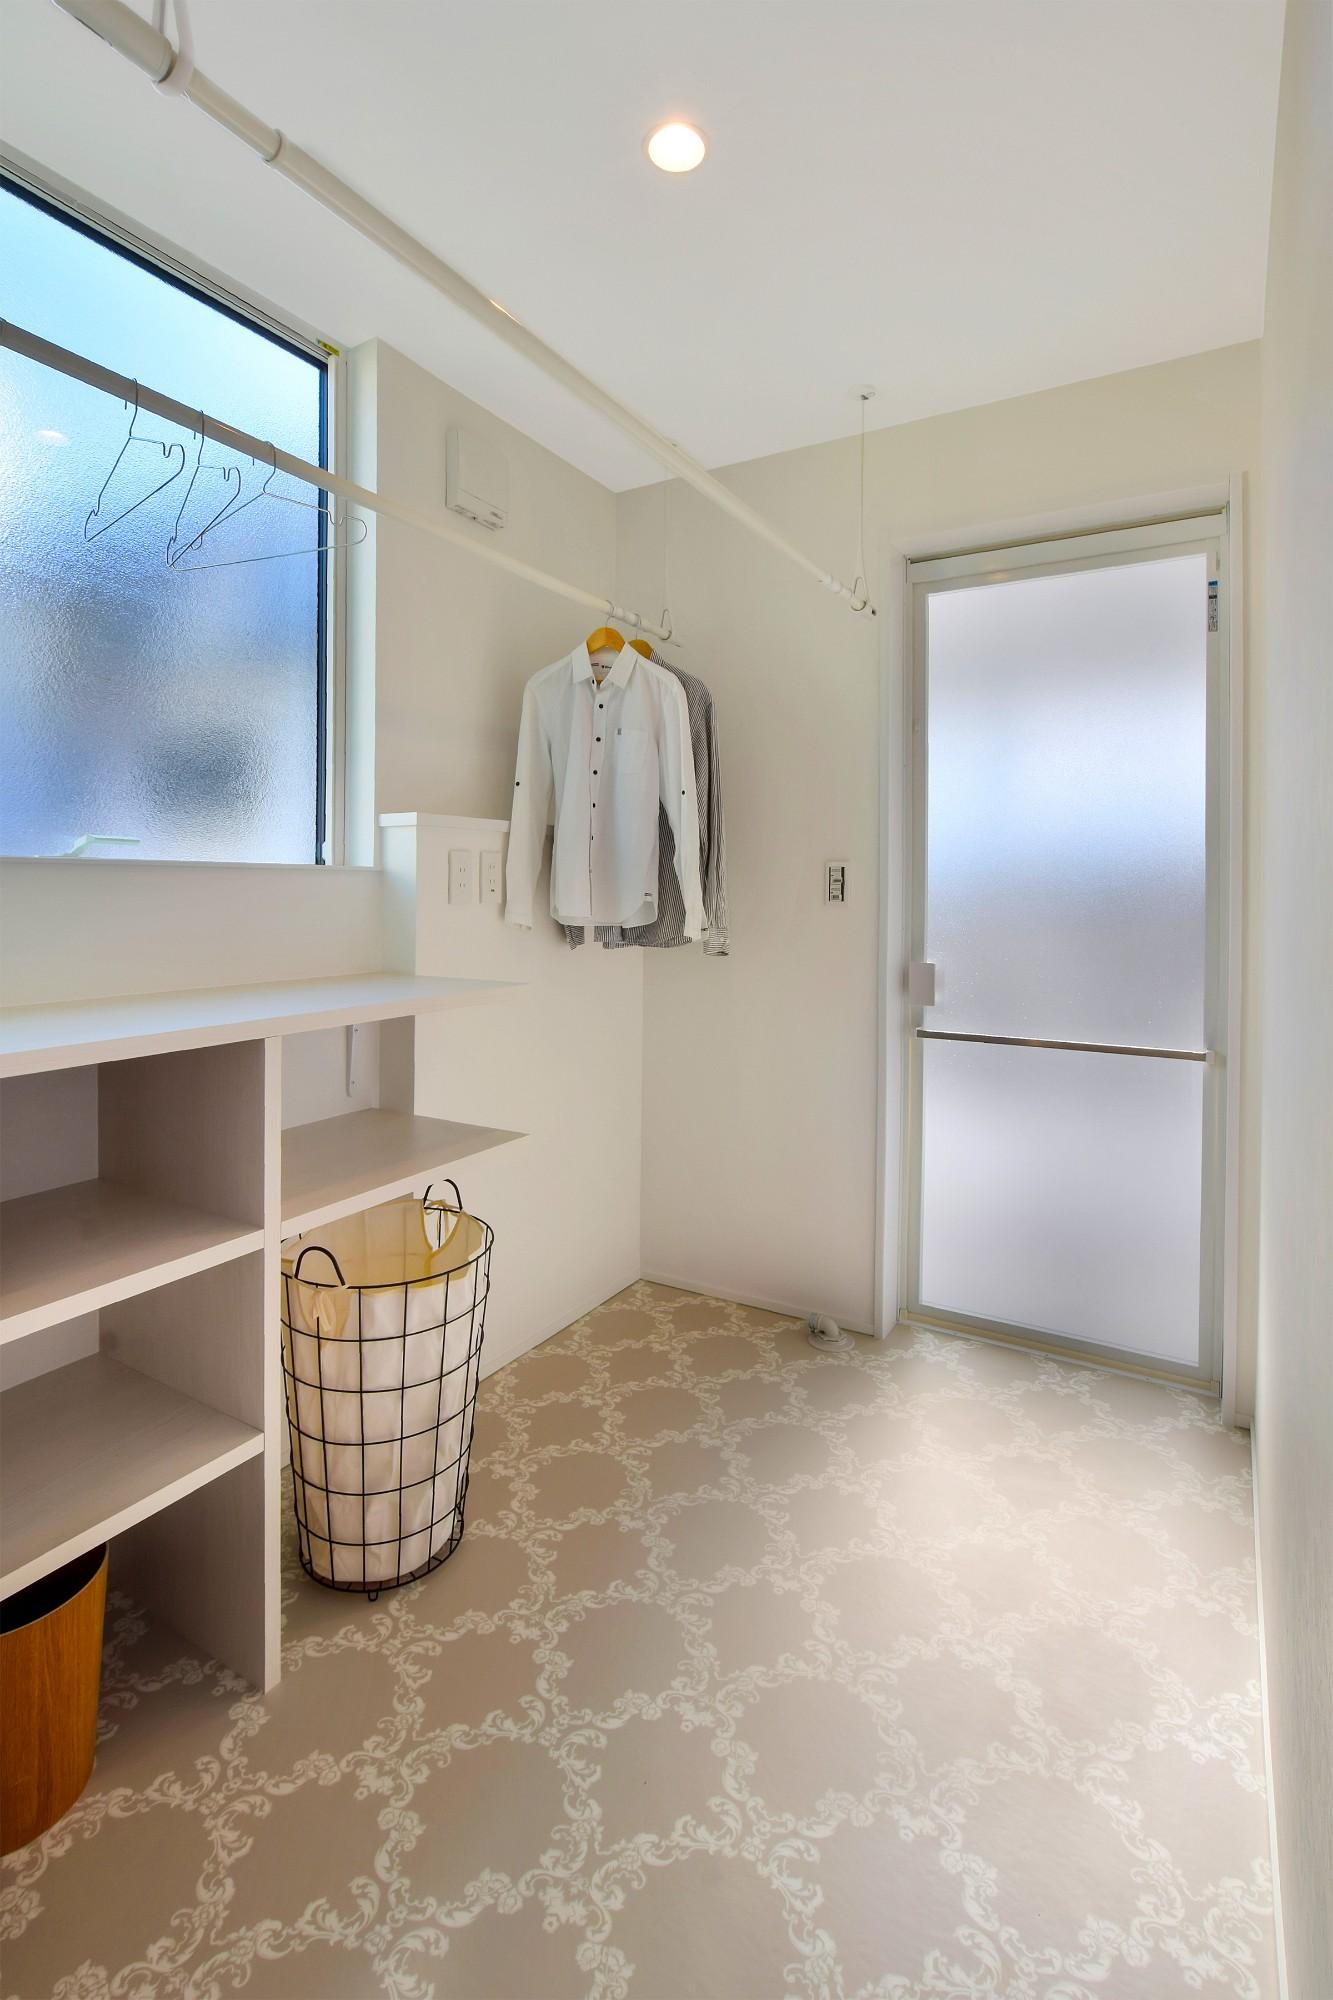 DETAIL HOME(ディテールホーム)「L字型LDKとプライベートデッキのある生活」のシンプル・ナチュラルな洗面所・脱衣所の実例写真